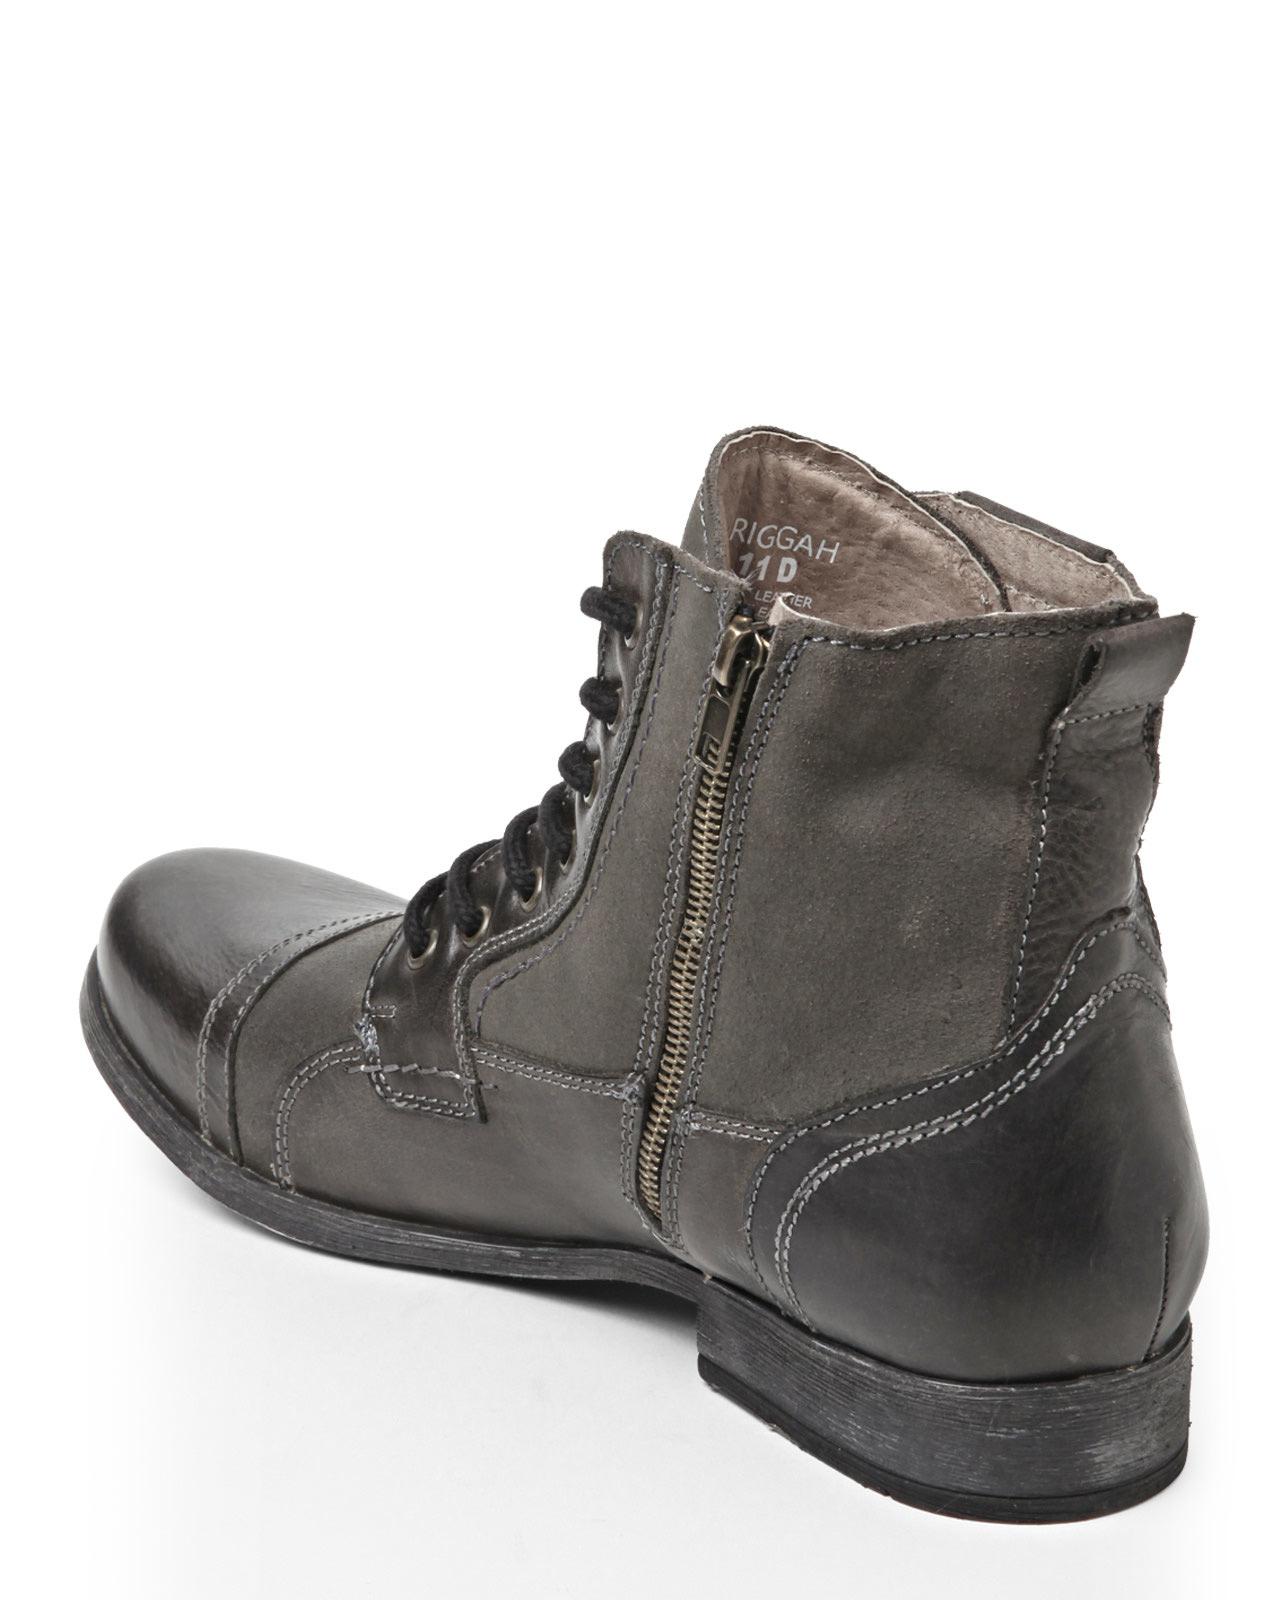 bc4e4f45e25 Steve Madden Black Triggah Boots for men